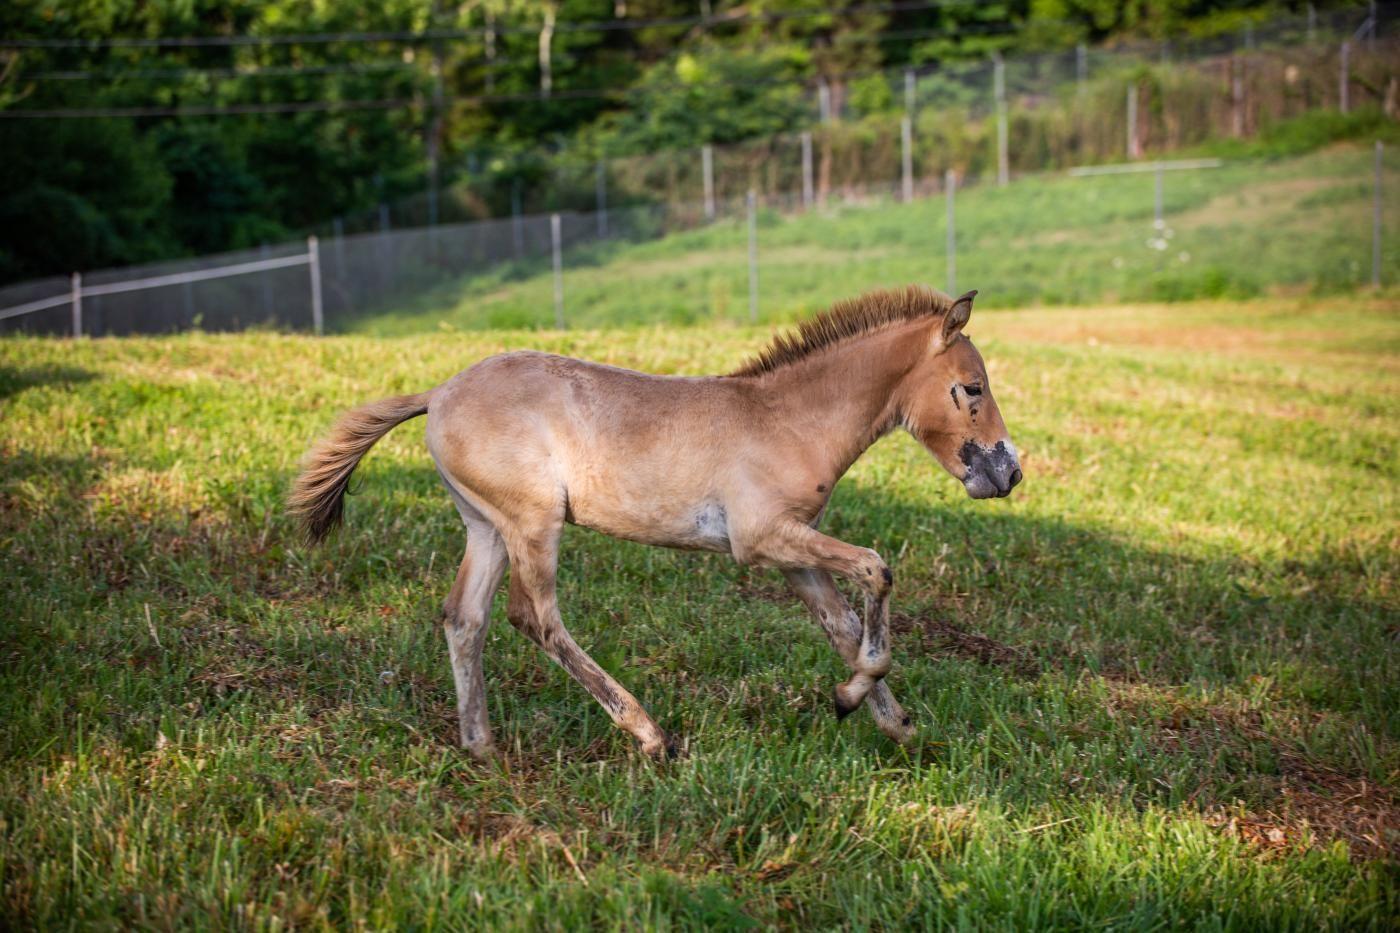 Steppenhoof, an endangered Przewalski's horse colt at the Smithsonian Conservation Biology Institute